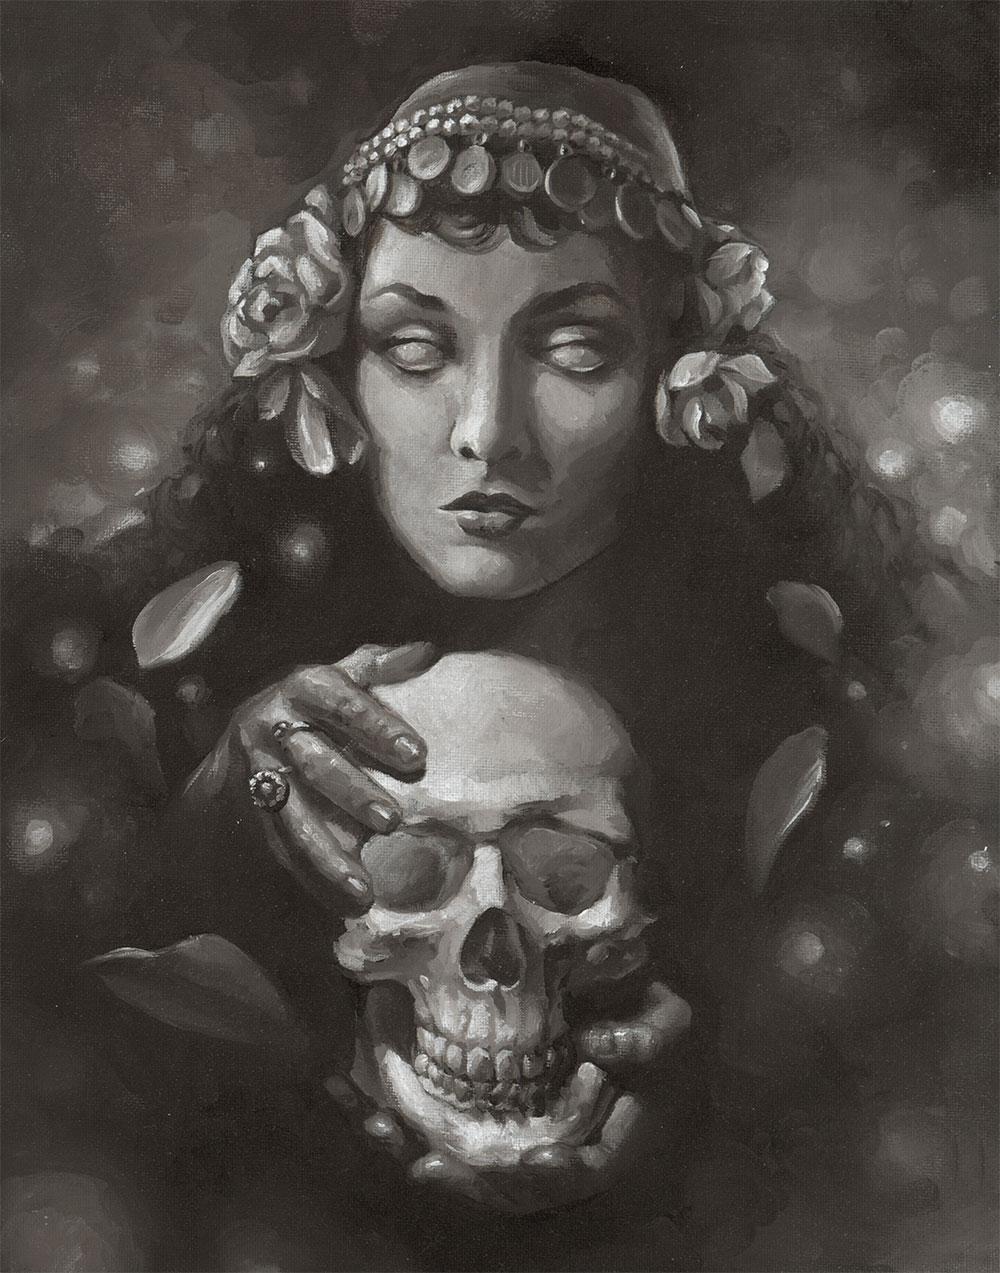 web-Gypsy-and-Skull-11x14